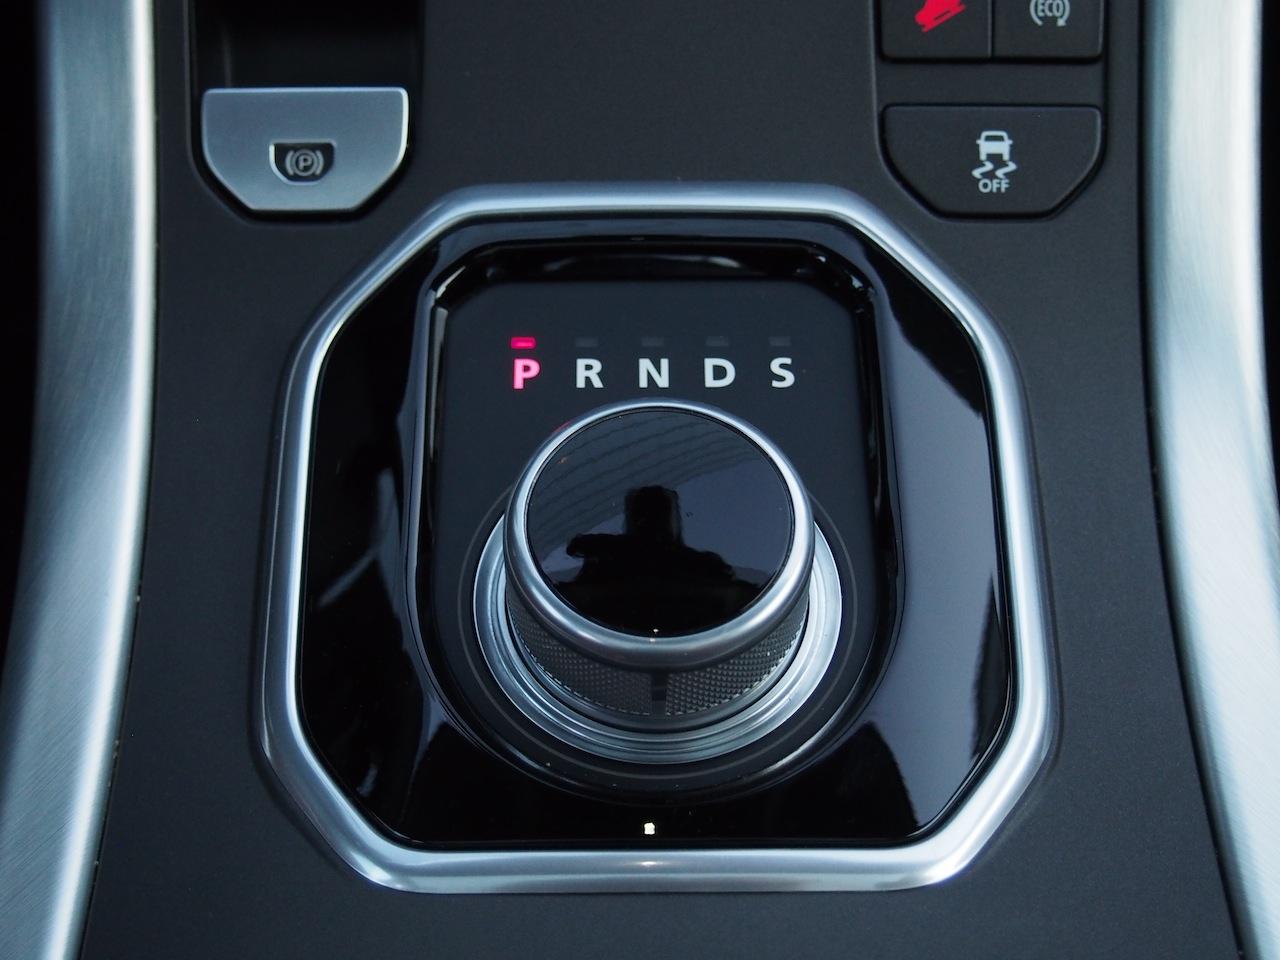 2014 Range Rover Evoque 5-Door Review - Cars, Photos, Test ...